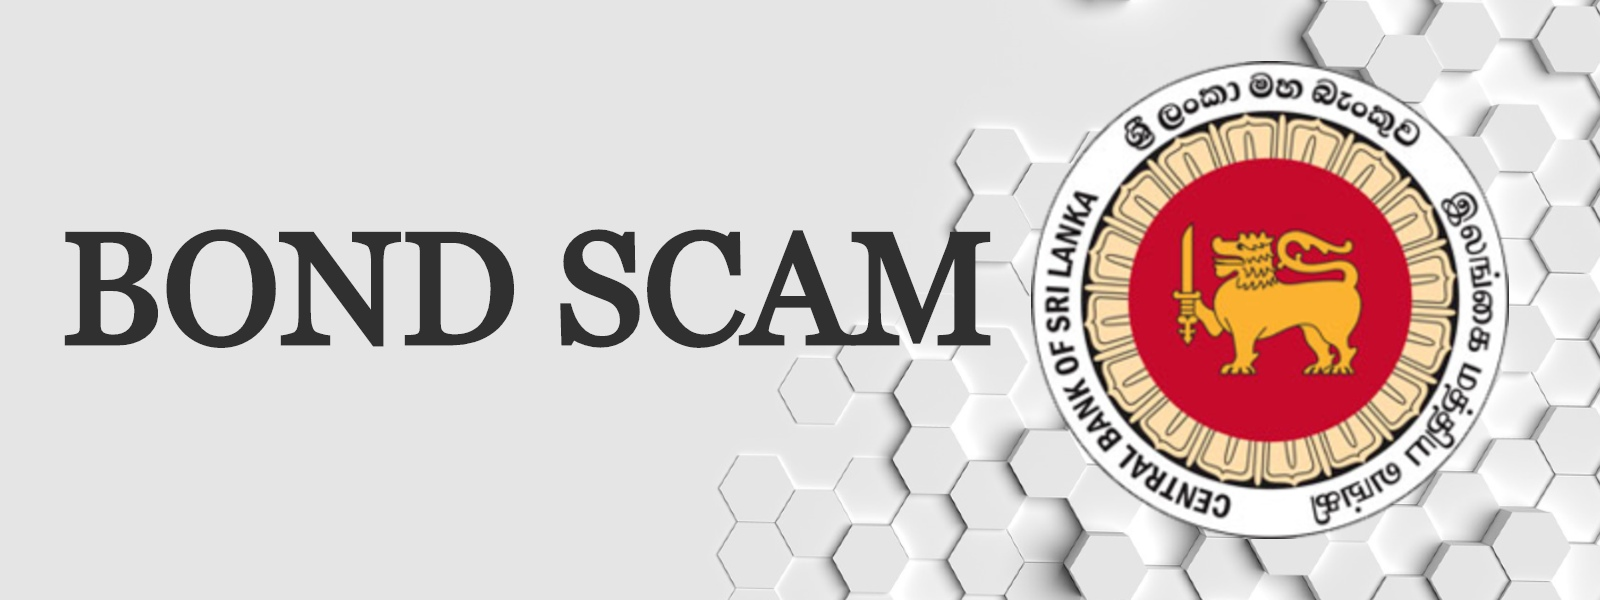 PTL Director Granted Bail in 2016 Bond Scam